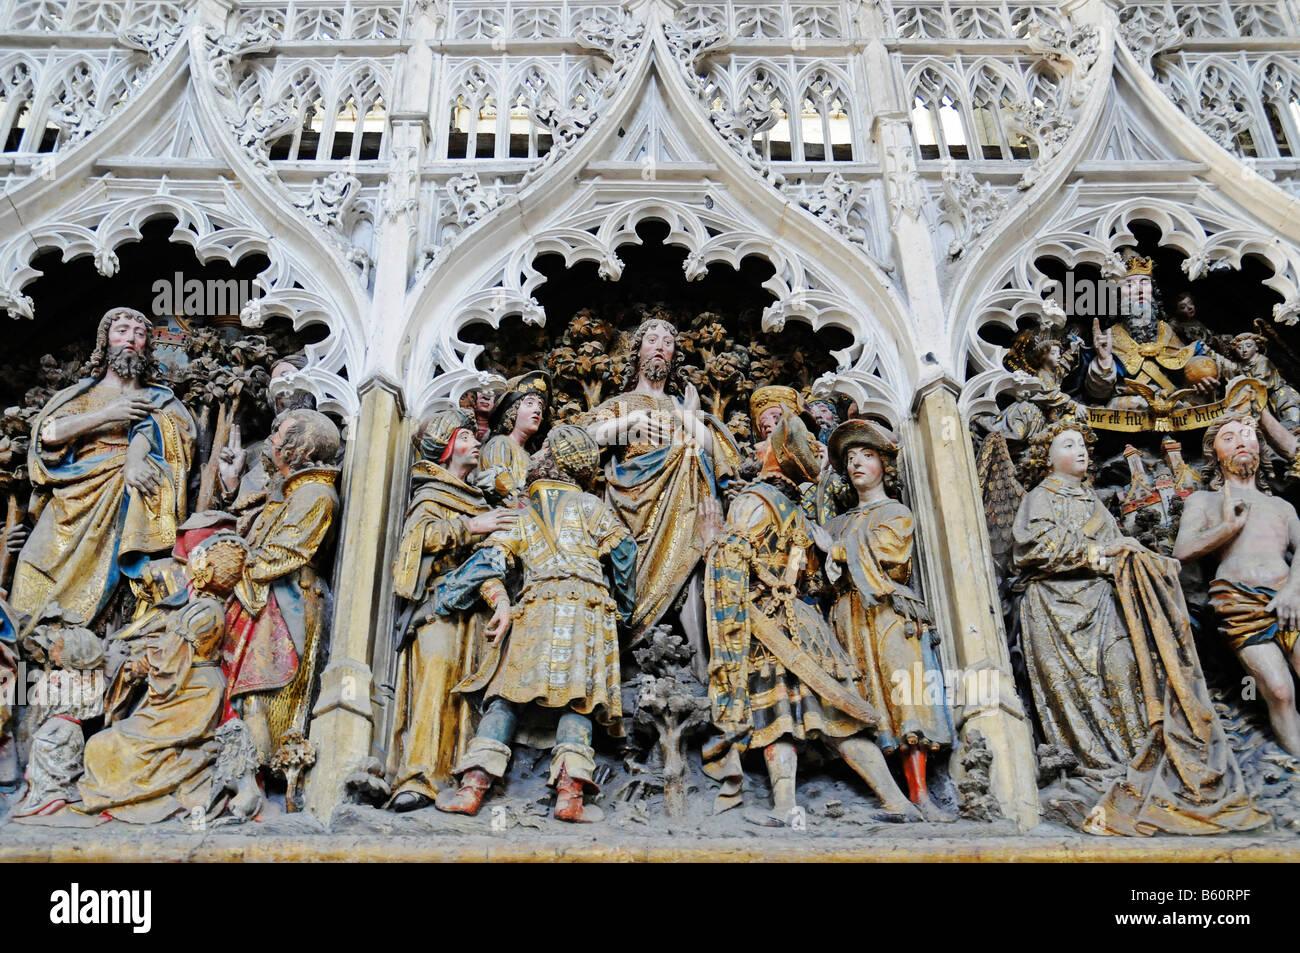 Choir, decoration, biblical depiction, Notre Dame Cathedral